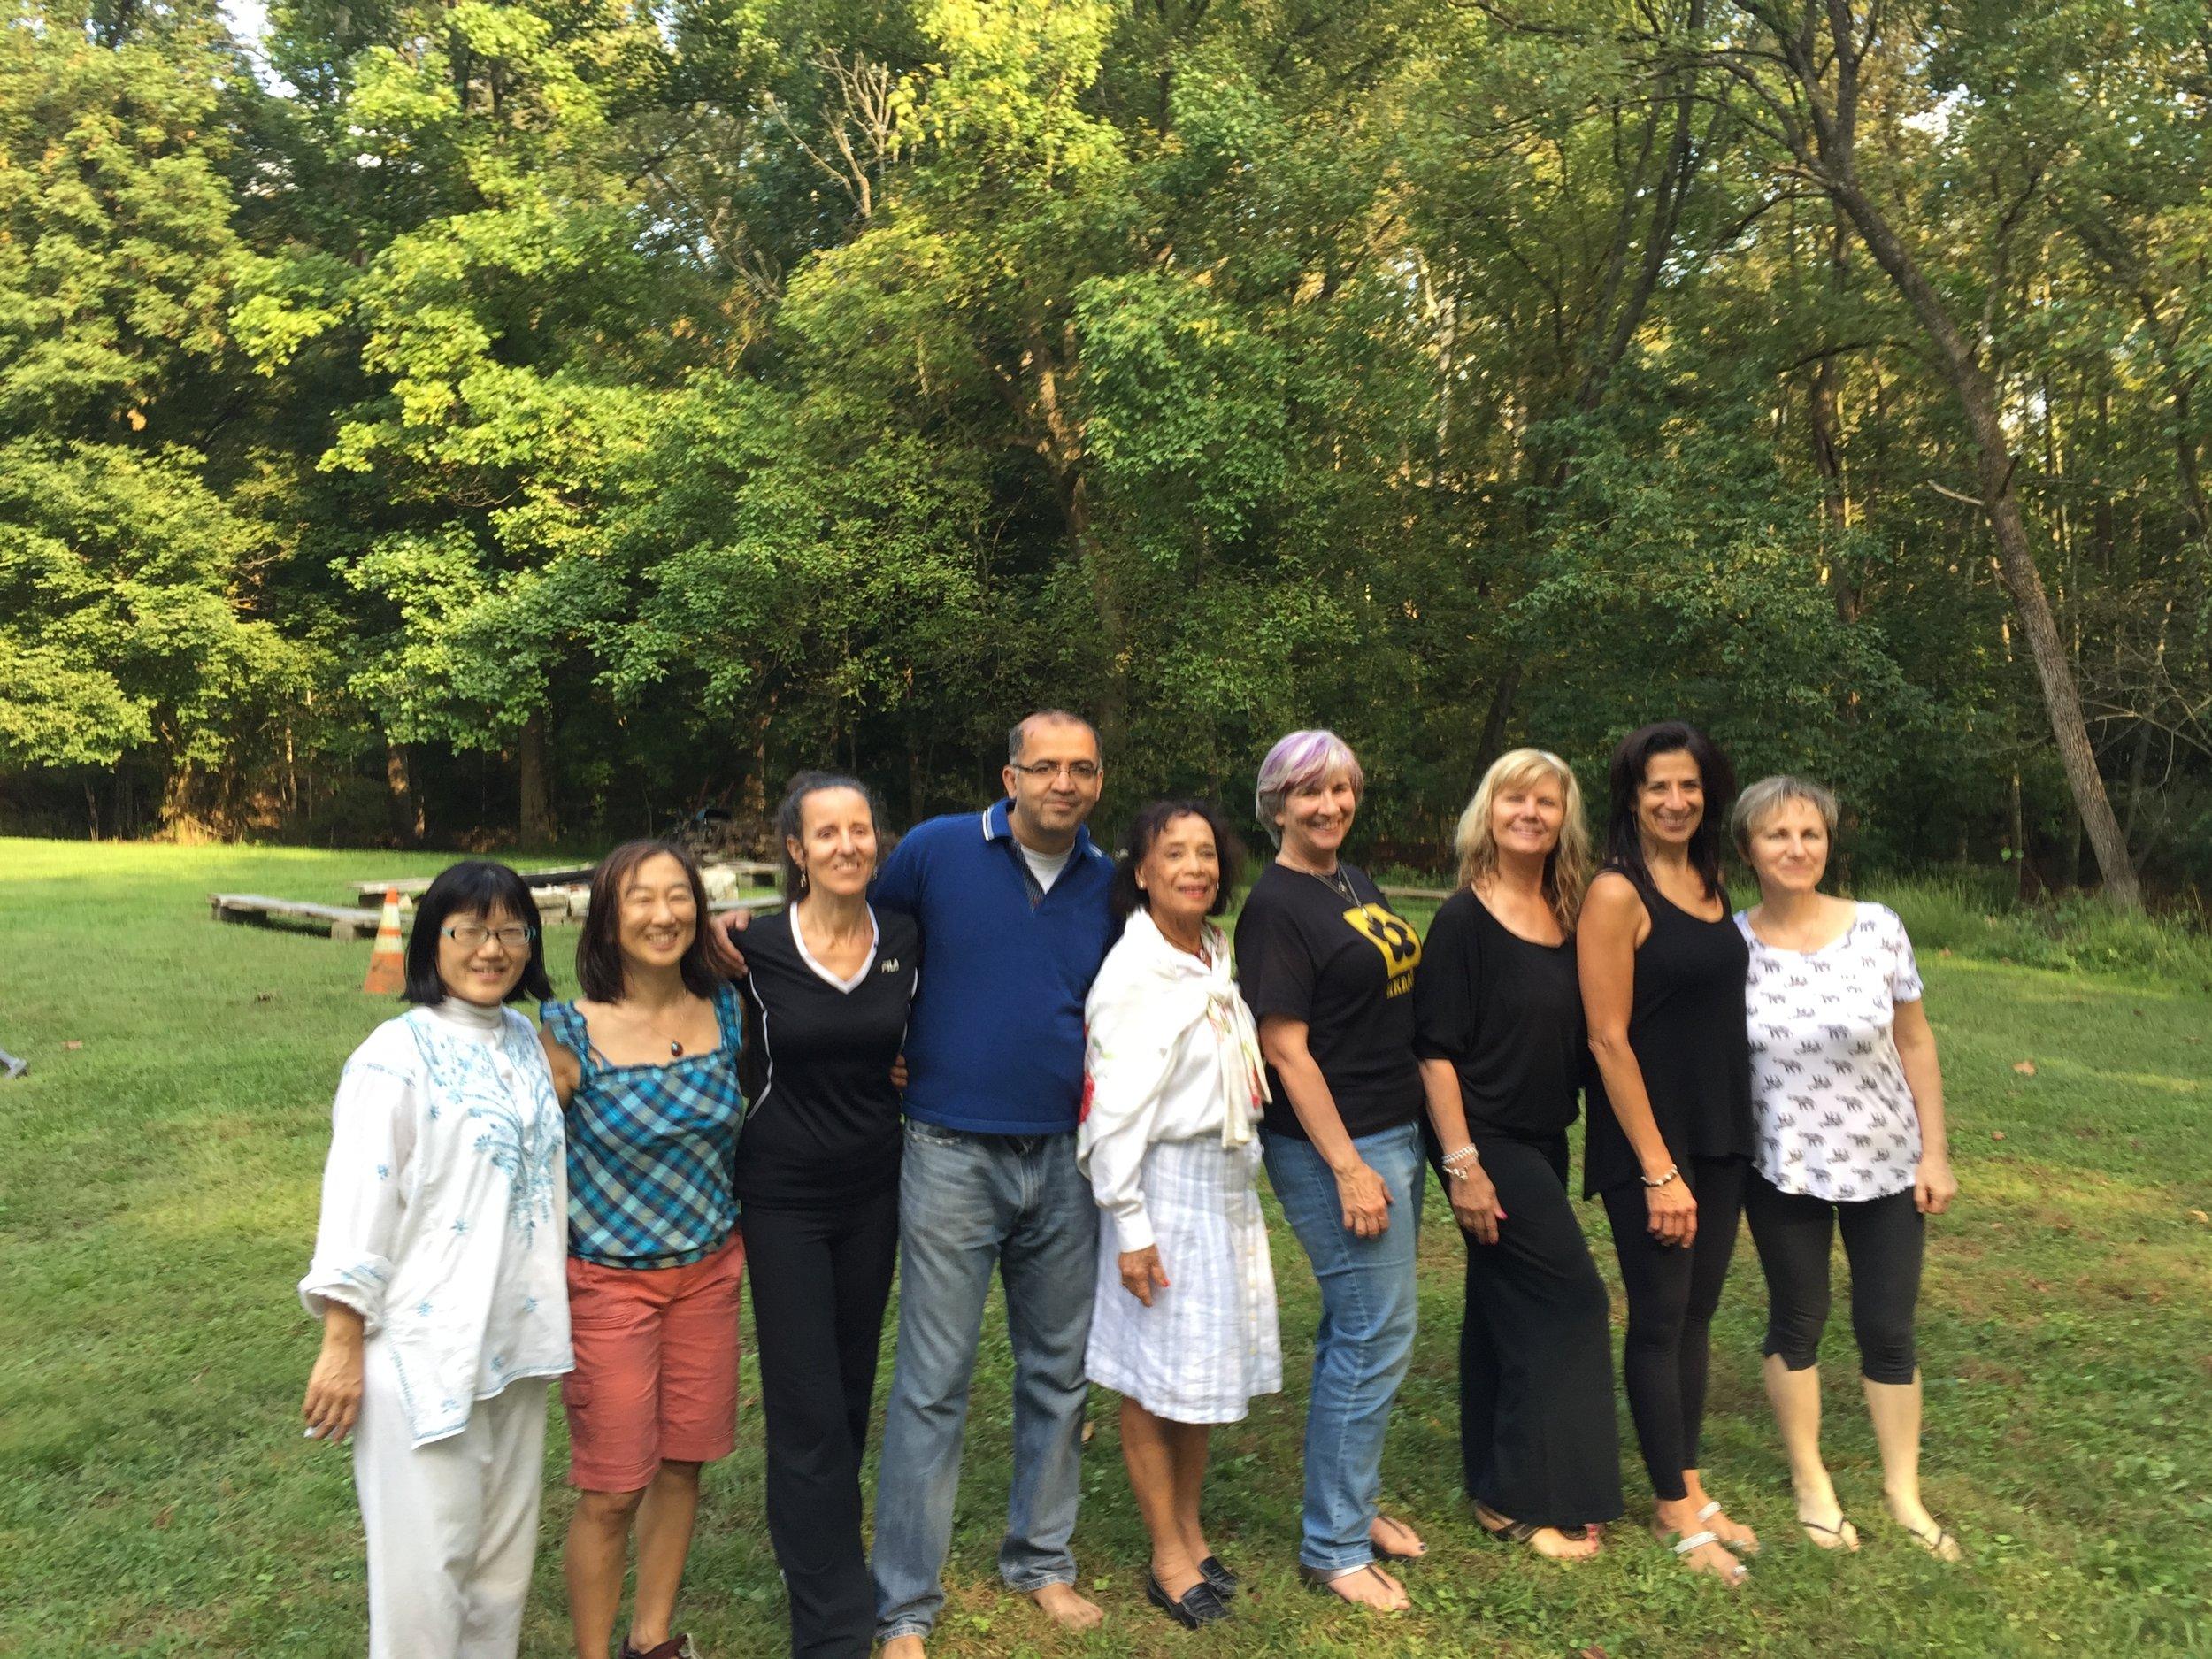 healing health alternative health shiatsu friendship love